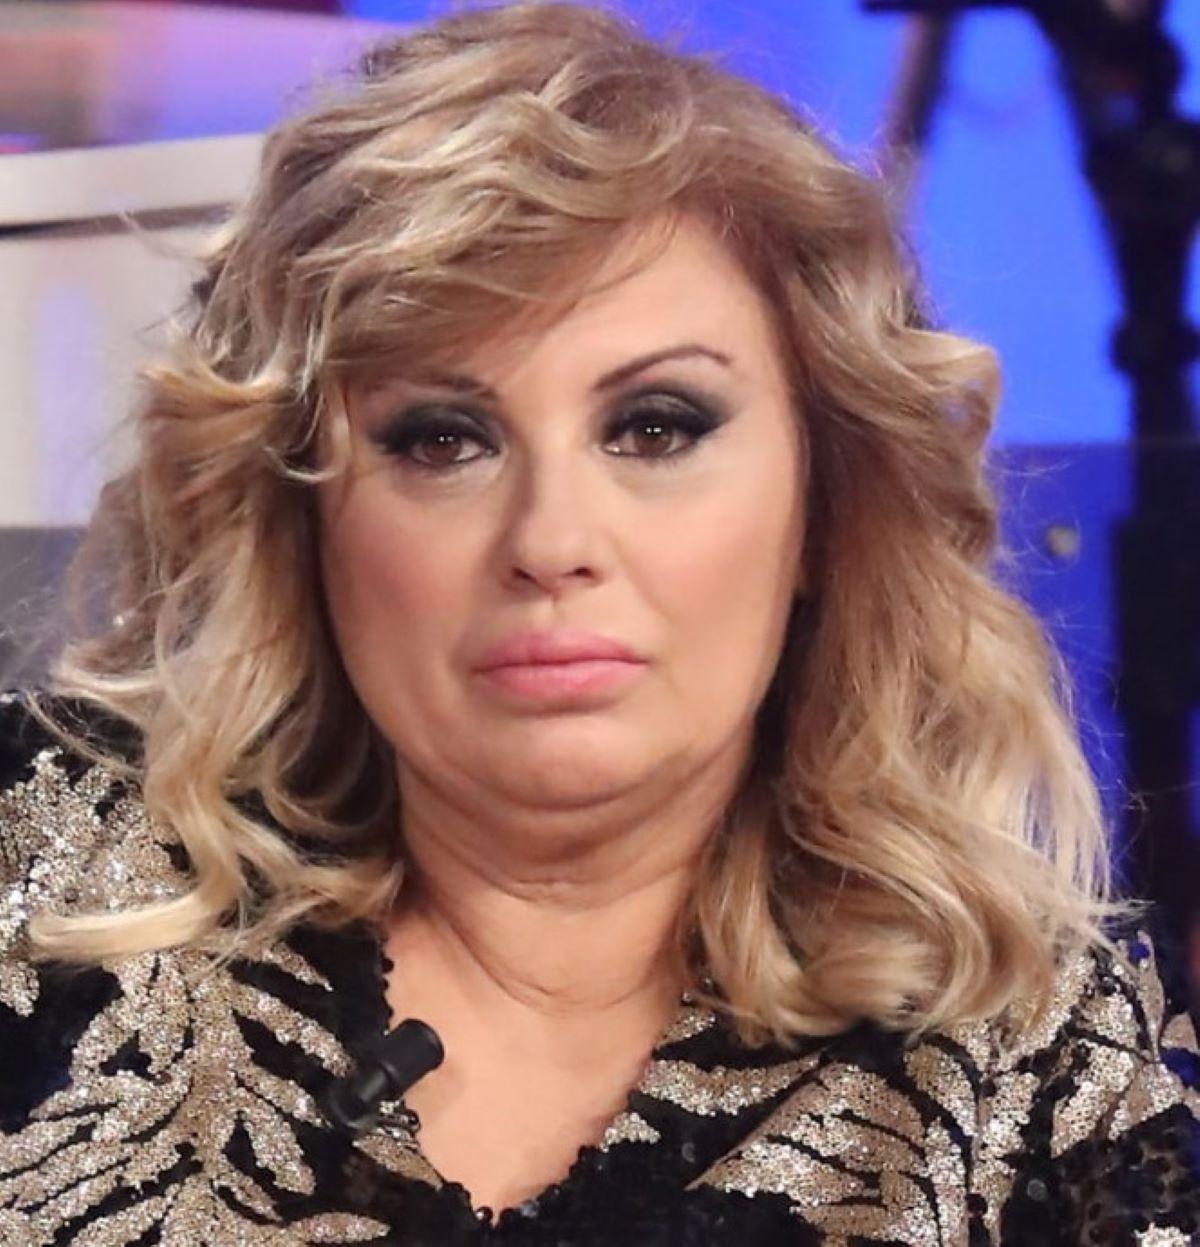 Tina Cipollari Accusa Rifatta Foto Vacanza